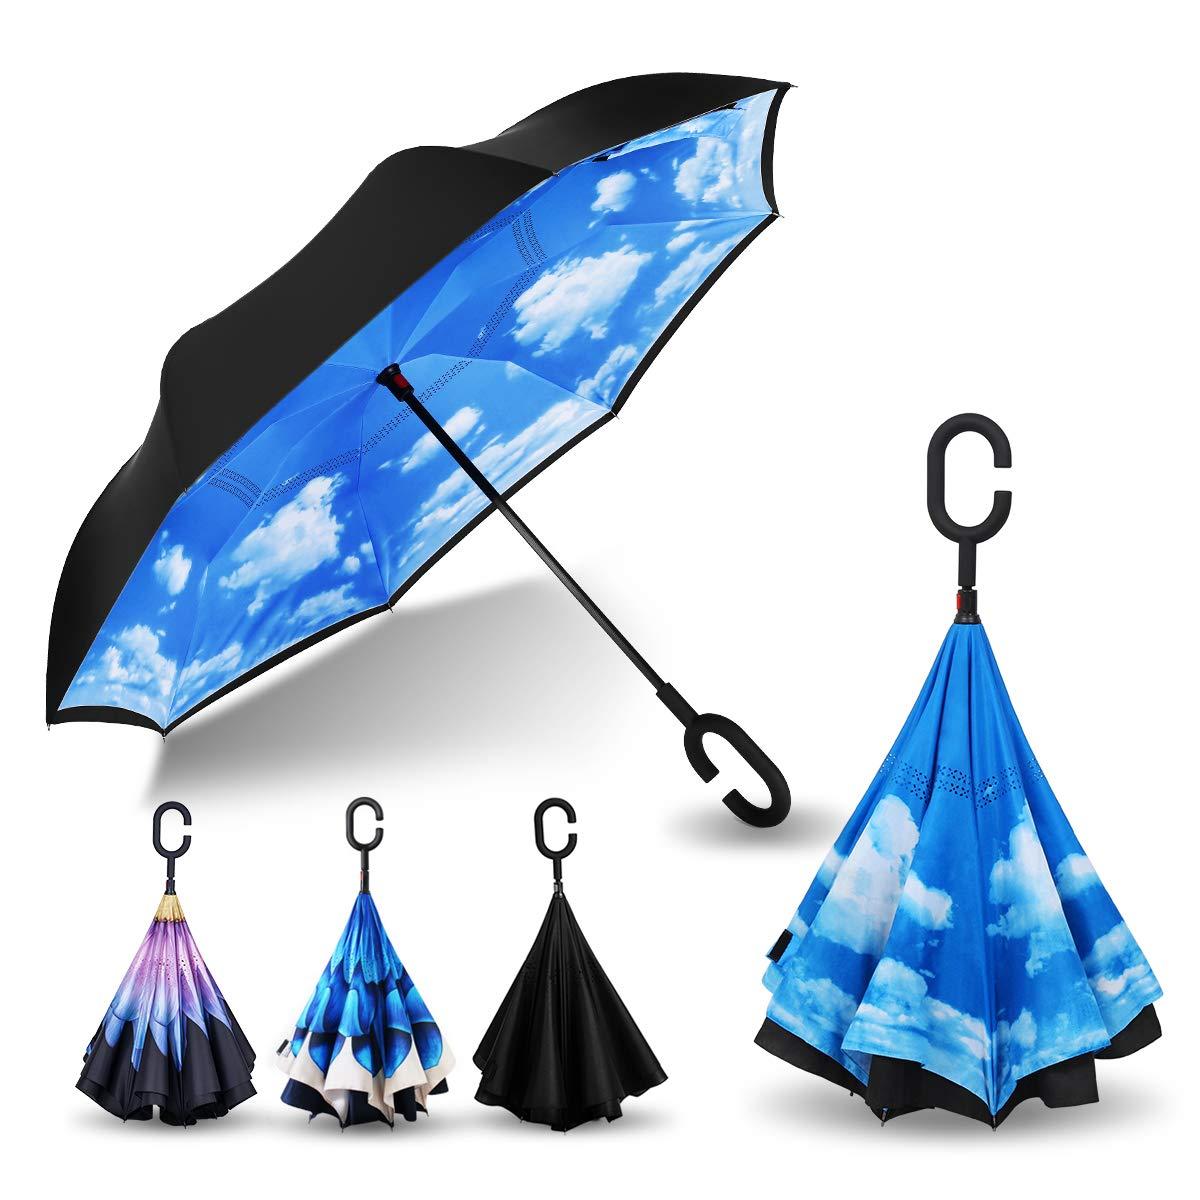 YY-Paraguas Reverse Umbrella Double-Layer Long Handle Large Hands-Free Inverted Folding Umbrella